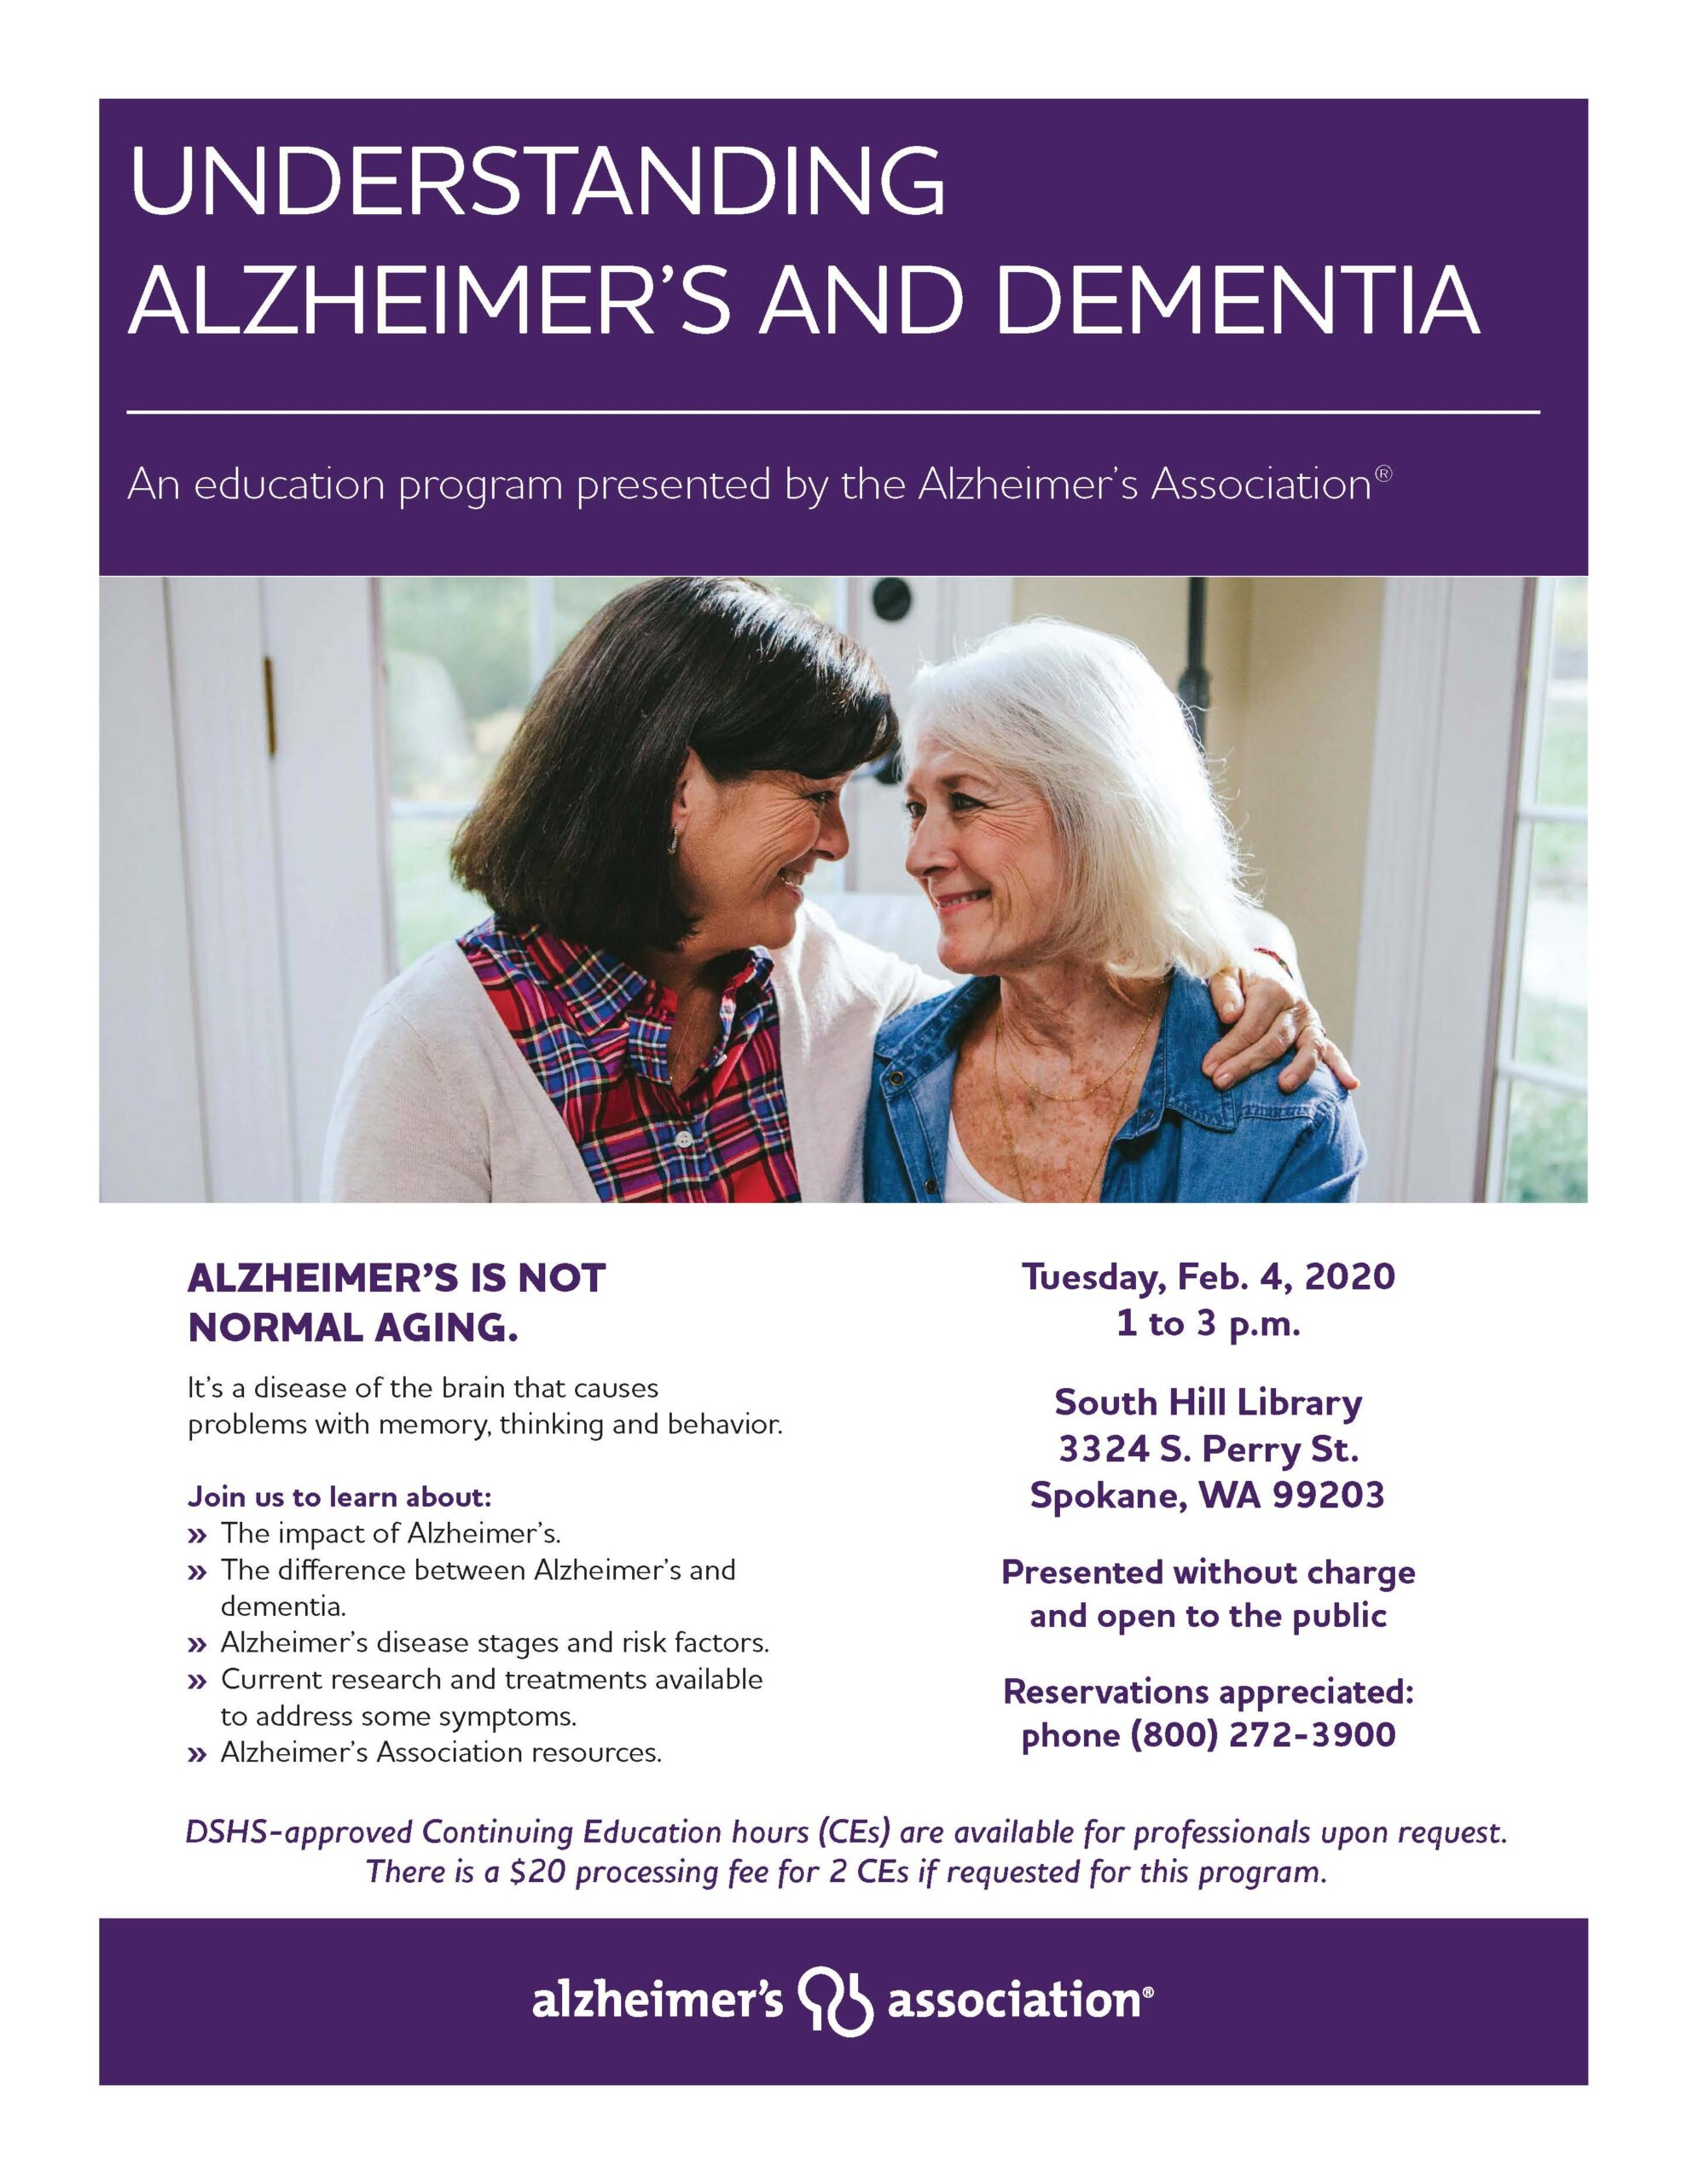 Understanding Alzheimer's and Dementia Presentation Spokane